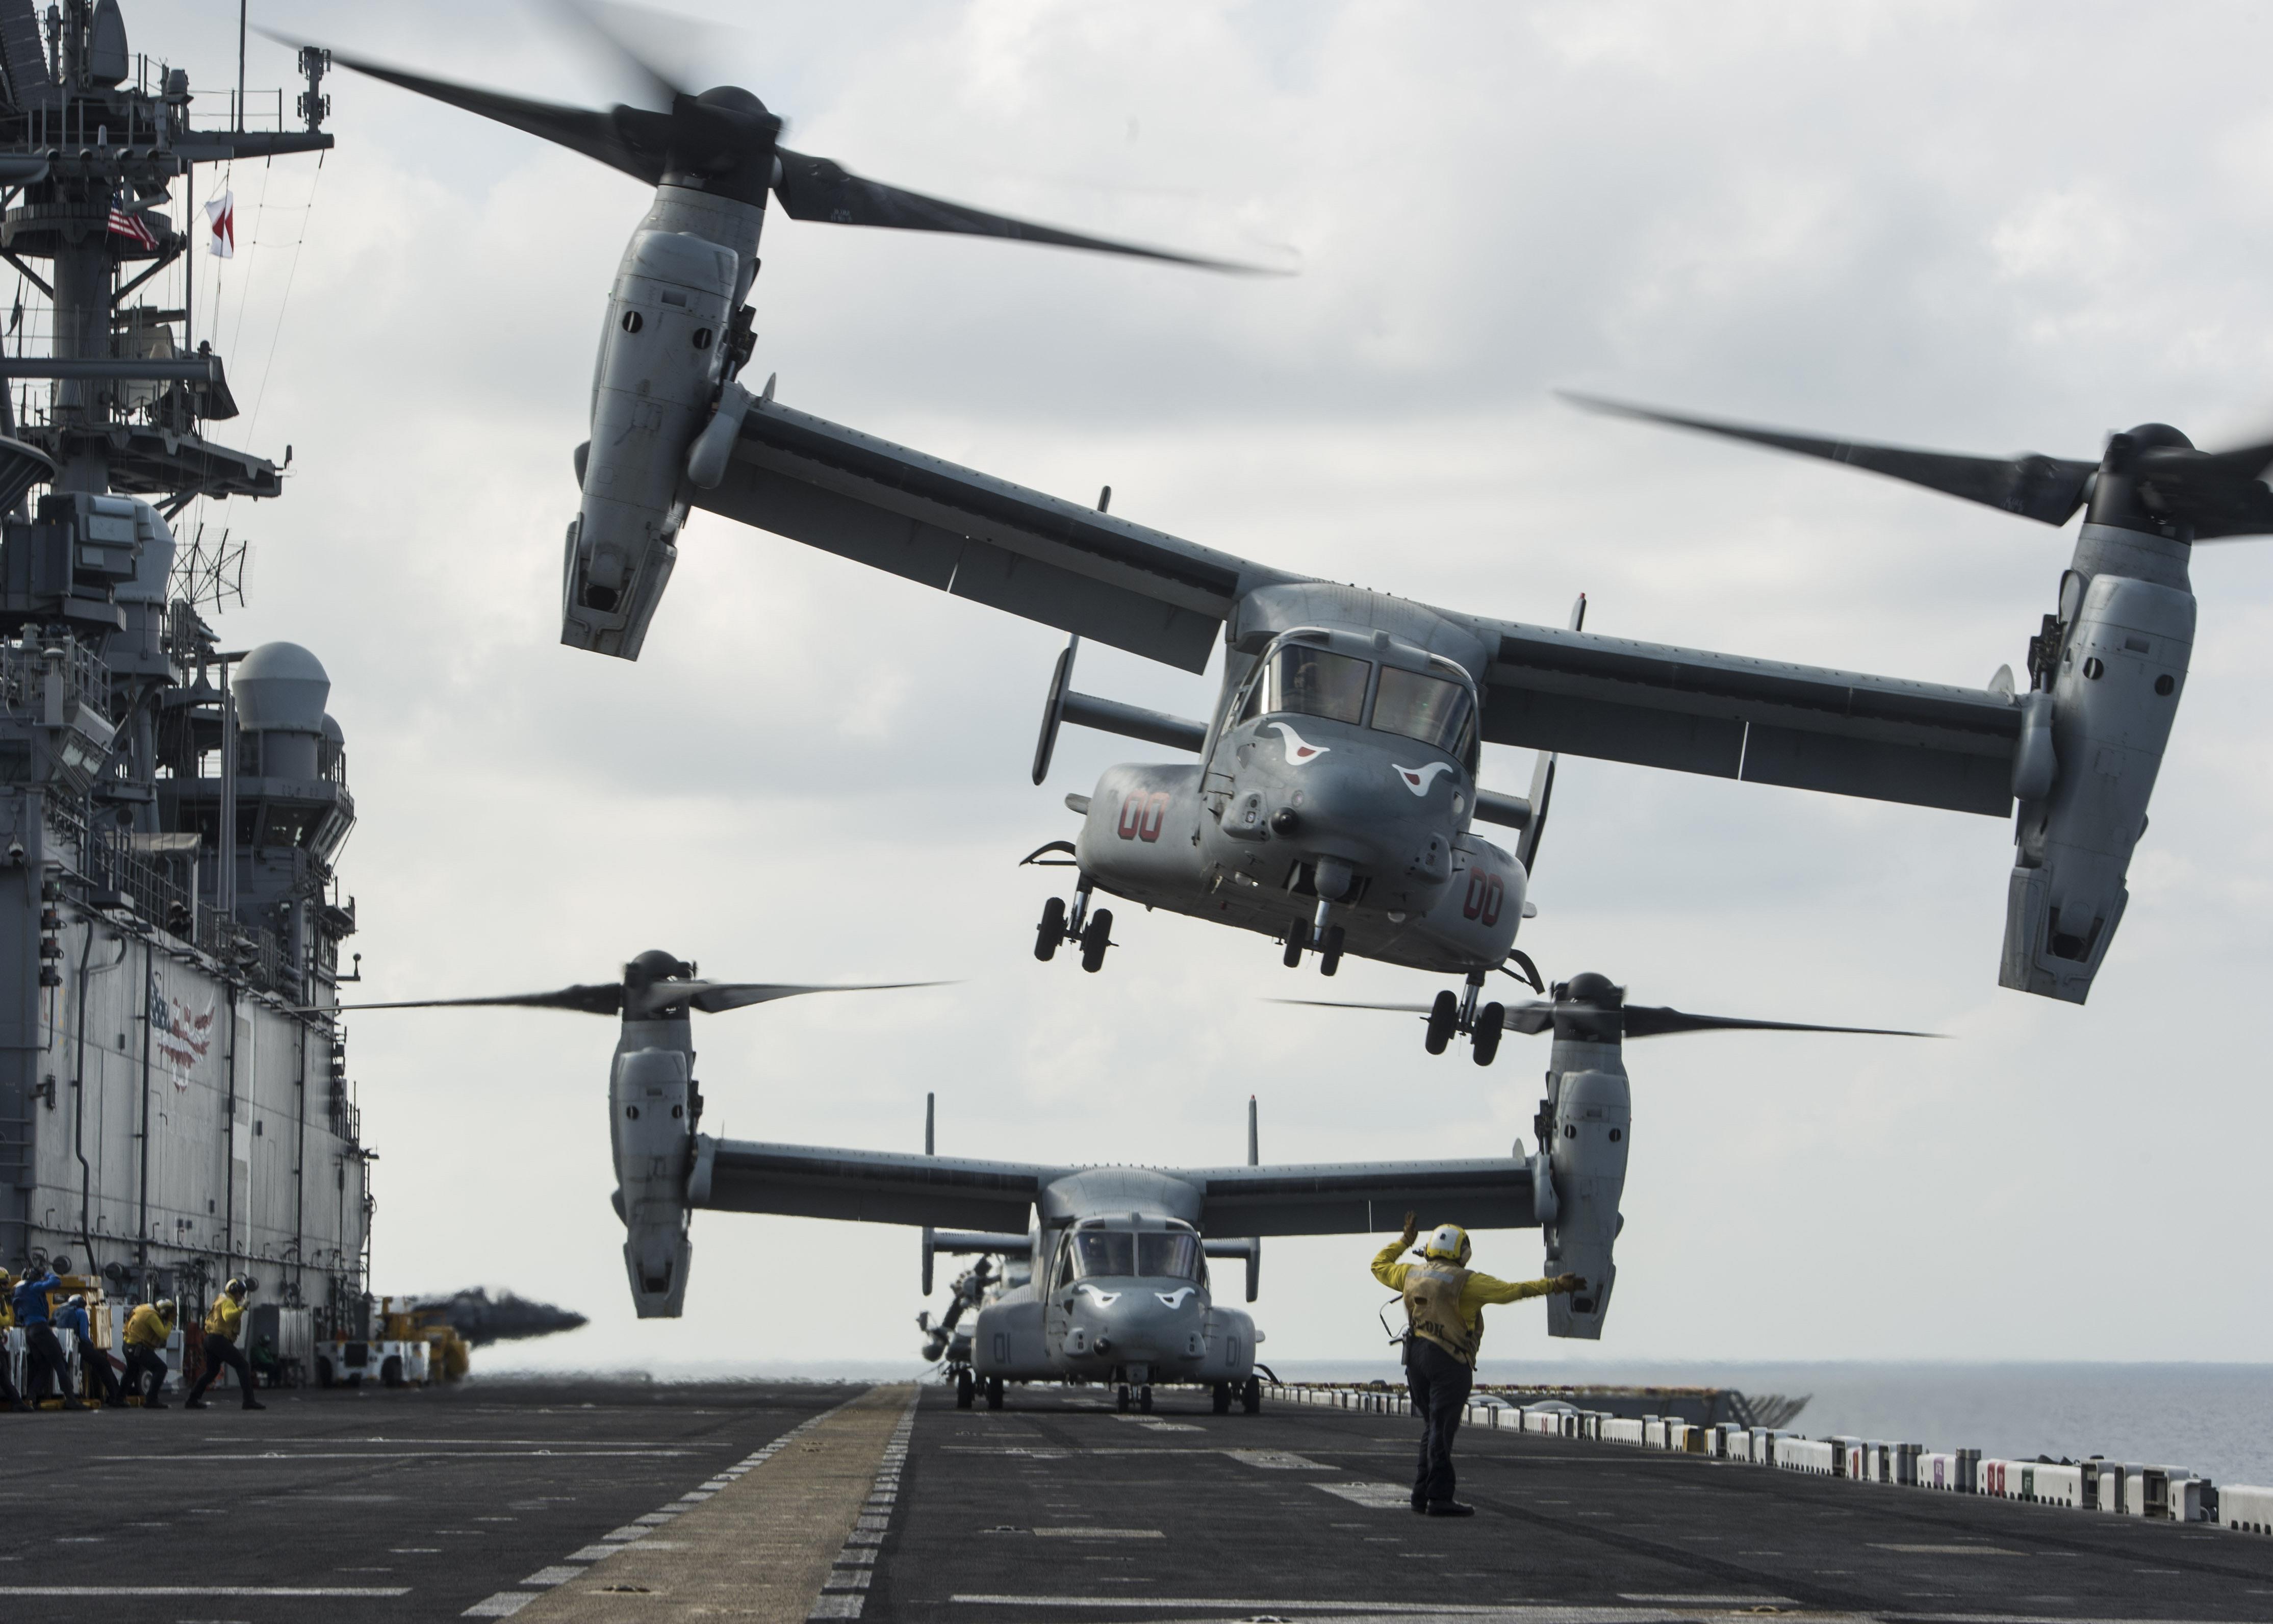 Navy Aircraft : F18 Hornet & Super Hornet - E-2 Hawkeye ... - Page 2 32780875851_46e5f35738_o